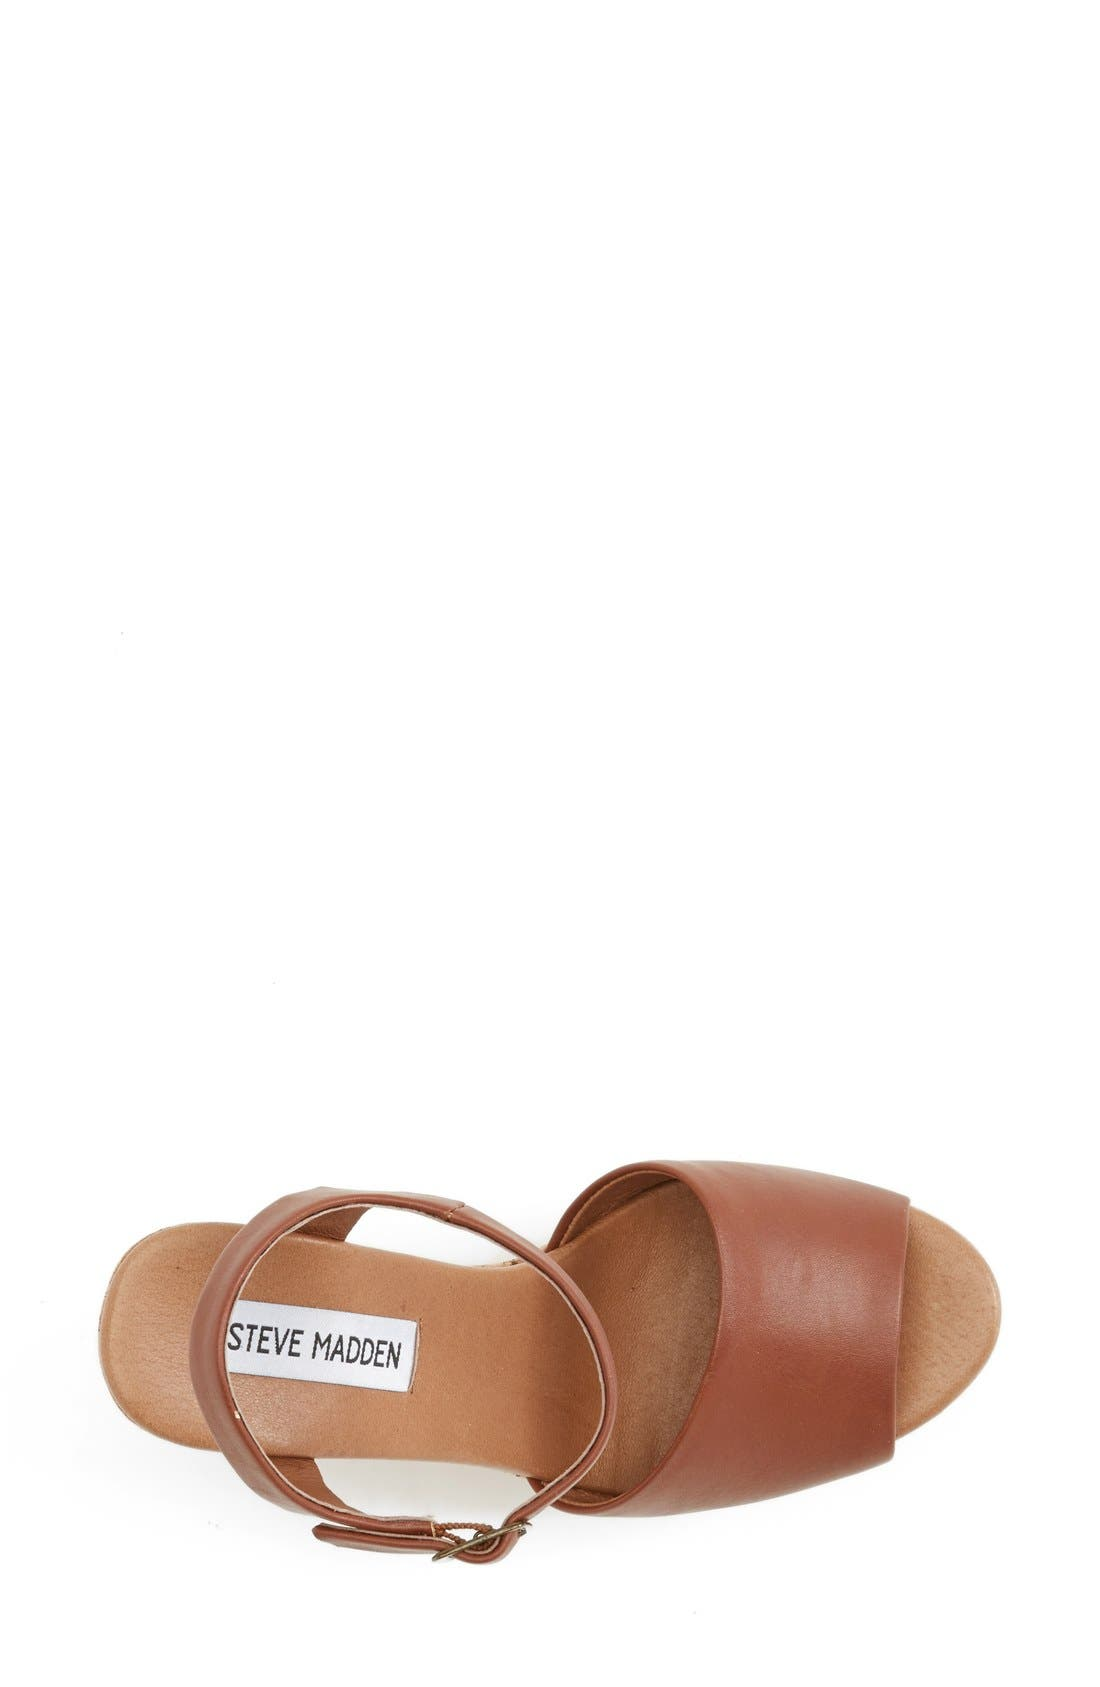 'Korkey' Ankle Strap Wedge Platform Sandal,                             Alternate thumbnail 3, color,                             Cognac